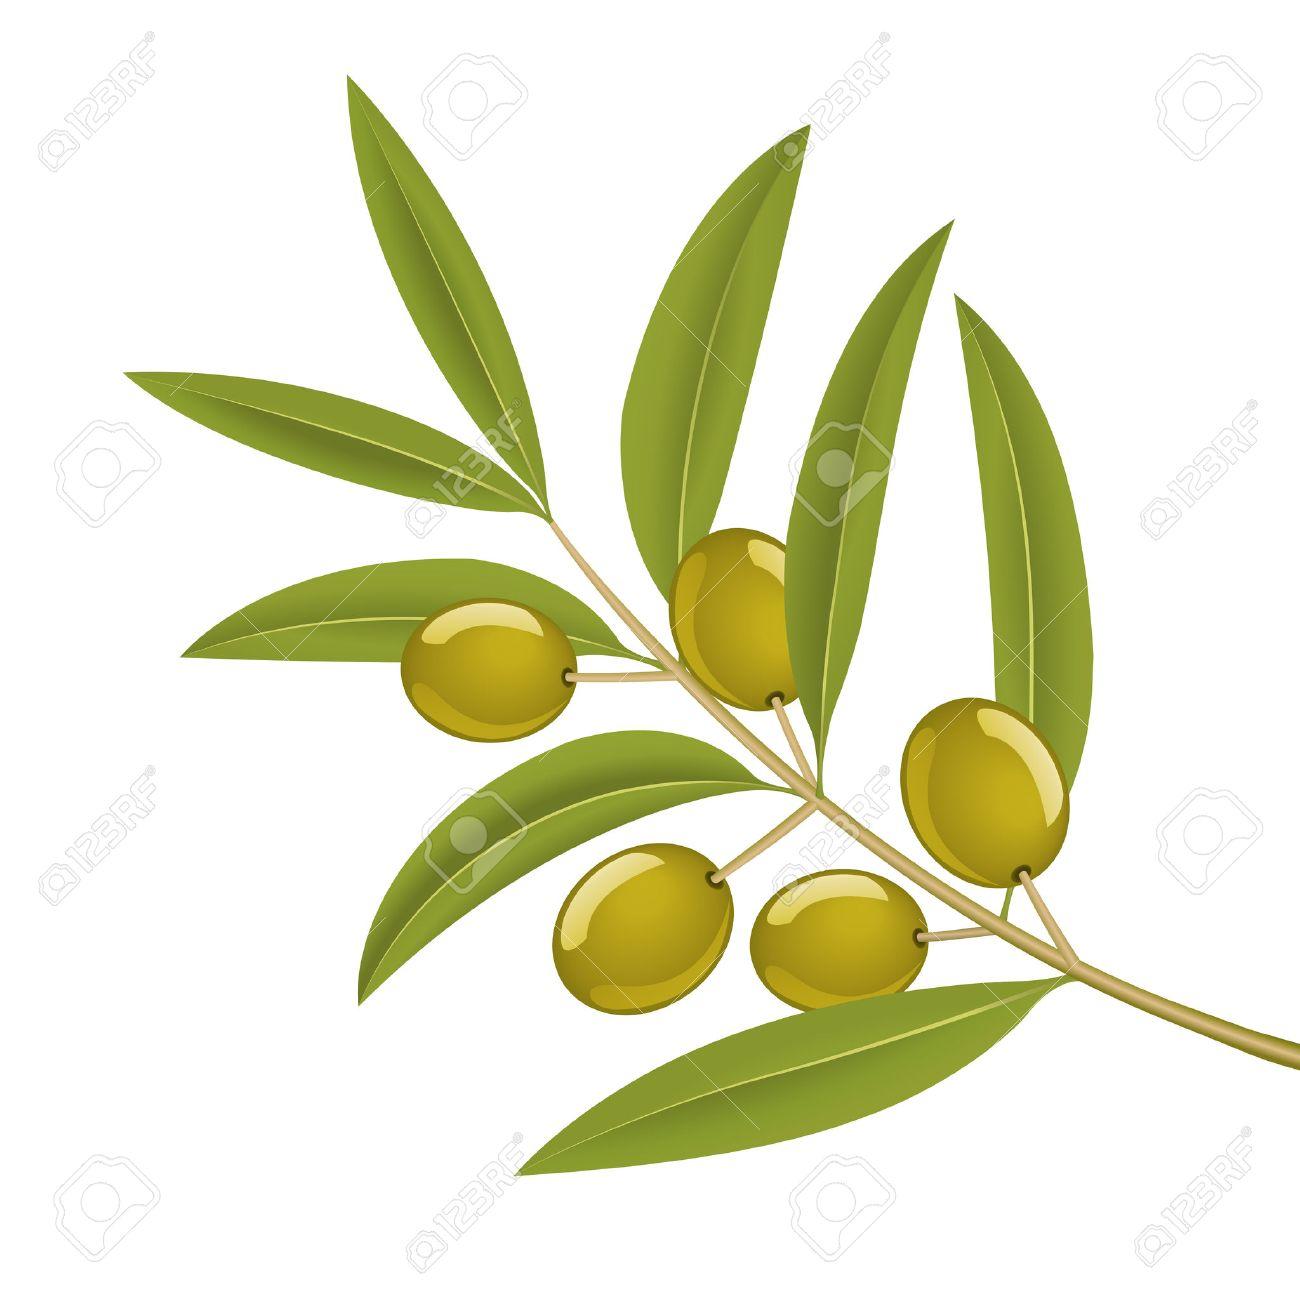 Green olives on branch, detailed vector illustration - 3176257